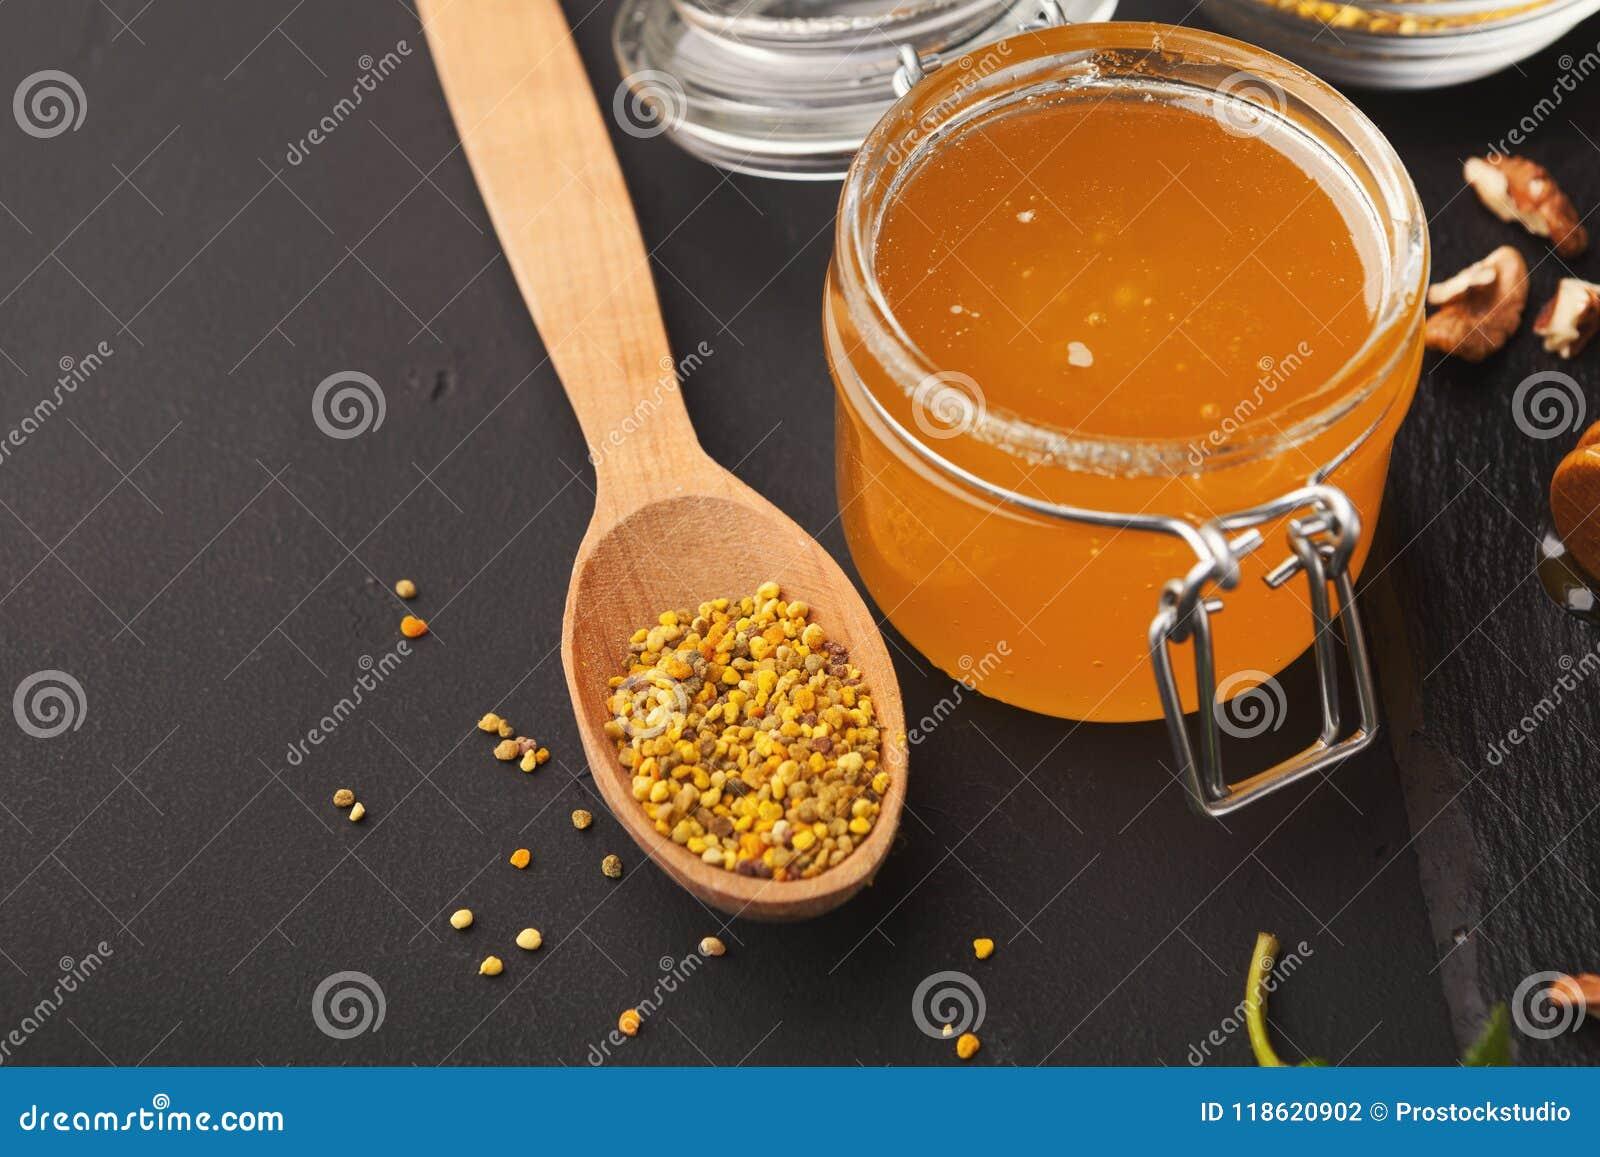 Jar Of Honey On Wooden Background Stock Photo Image Of Fructose